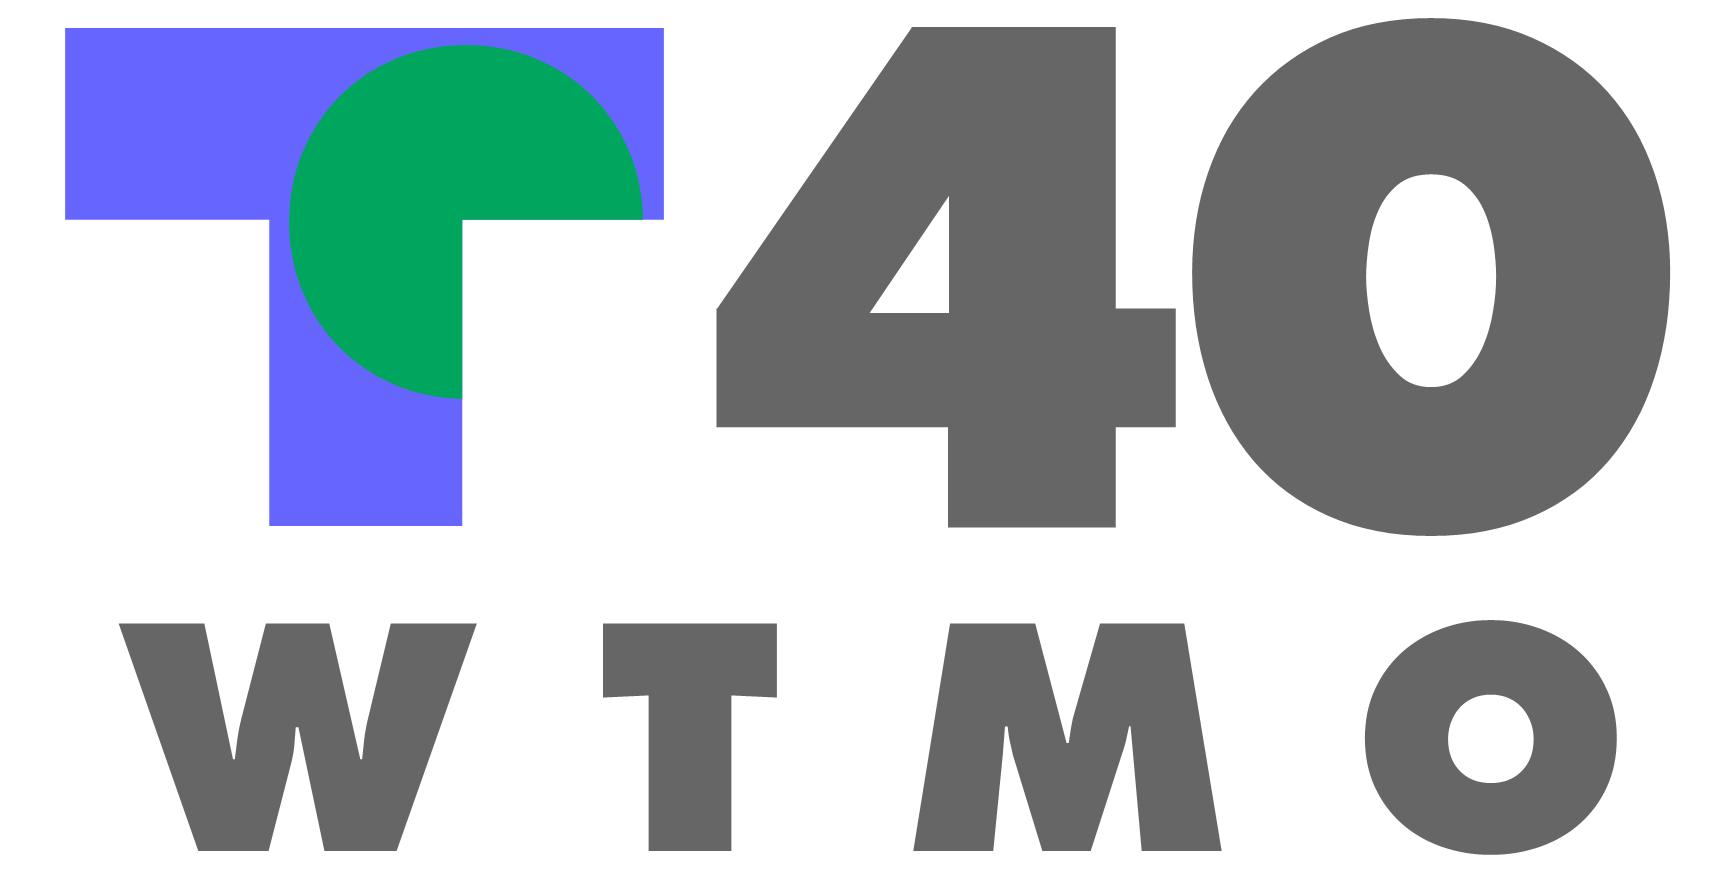 WTMO-CD